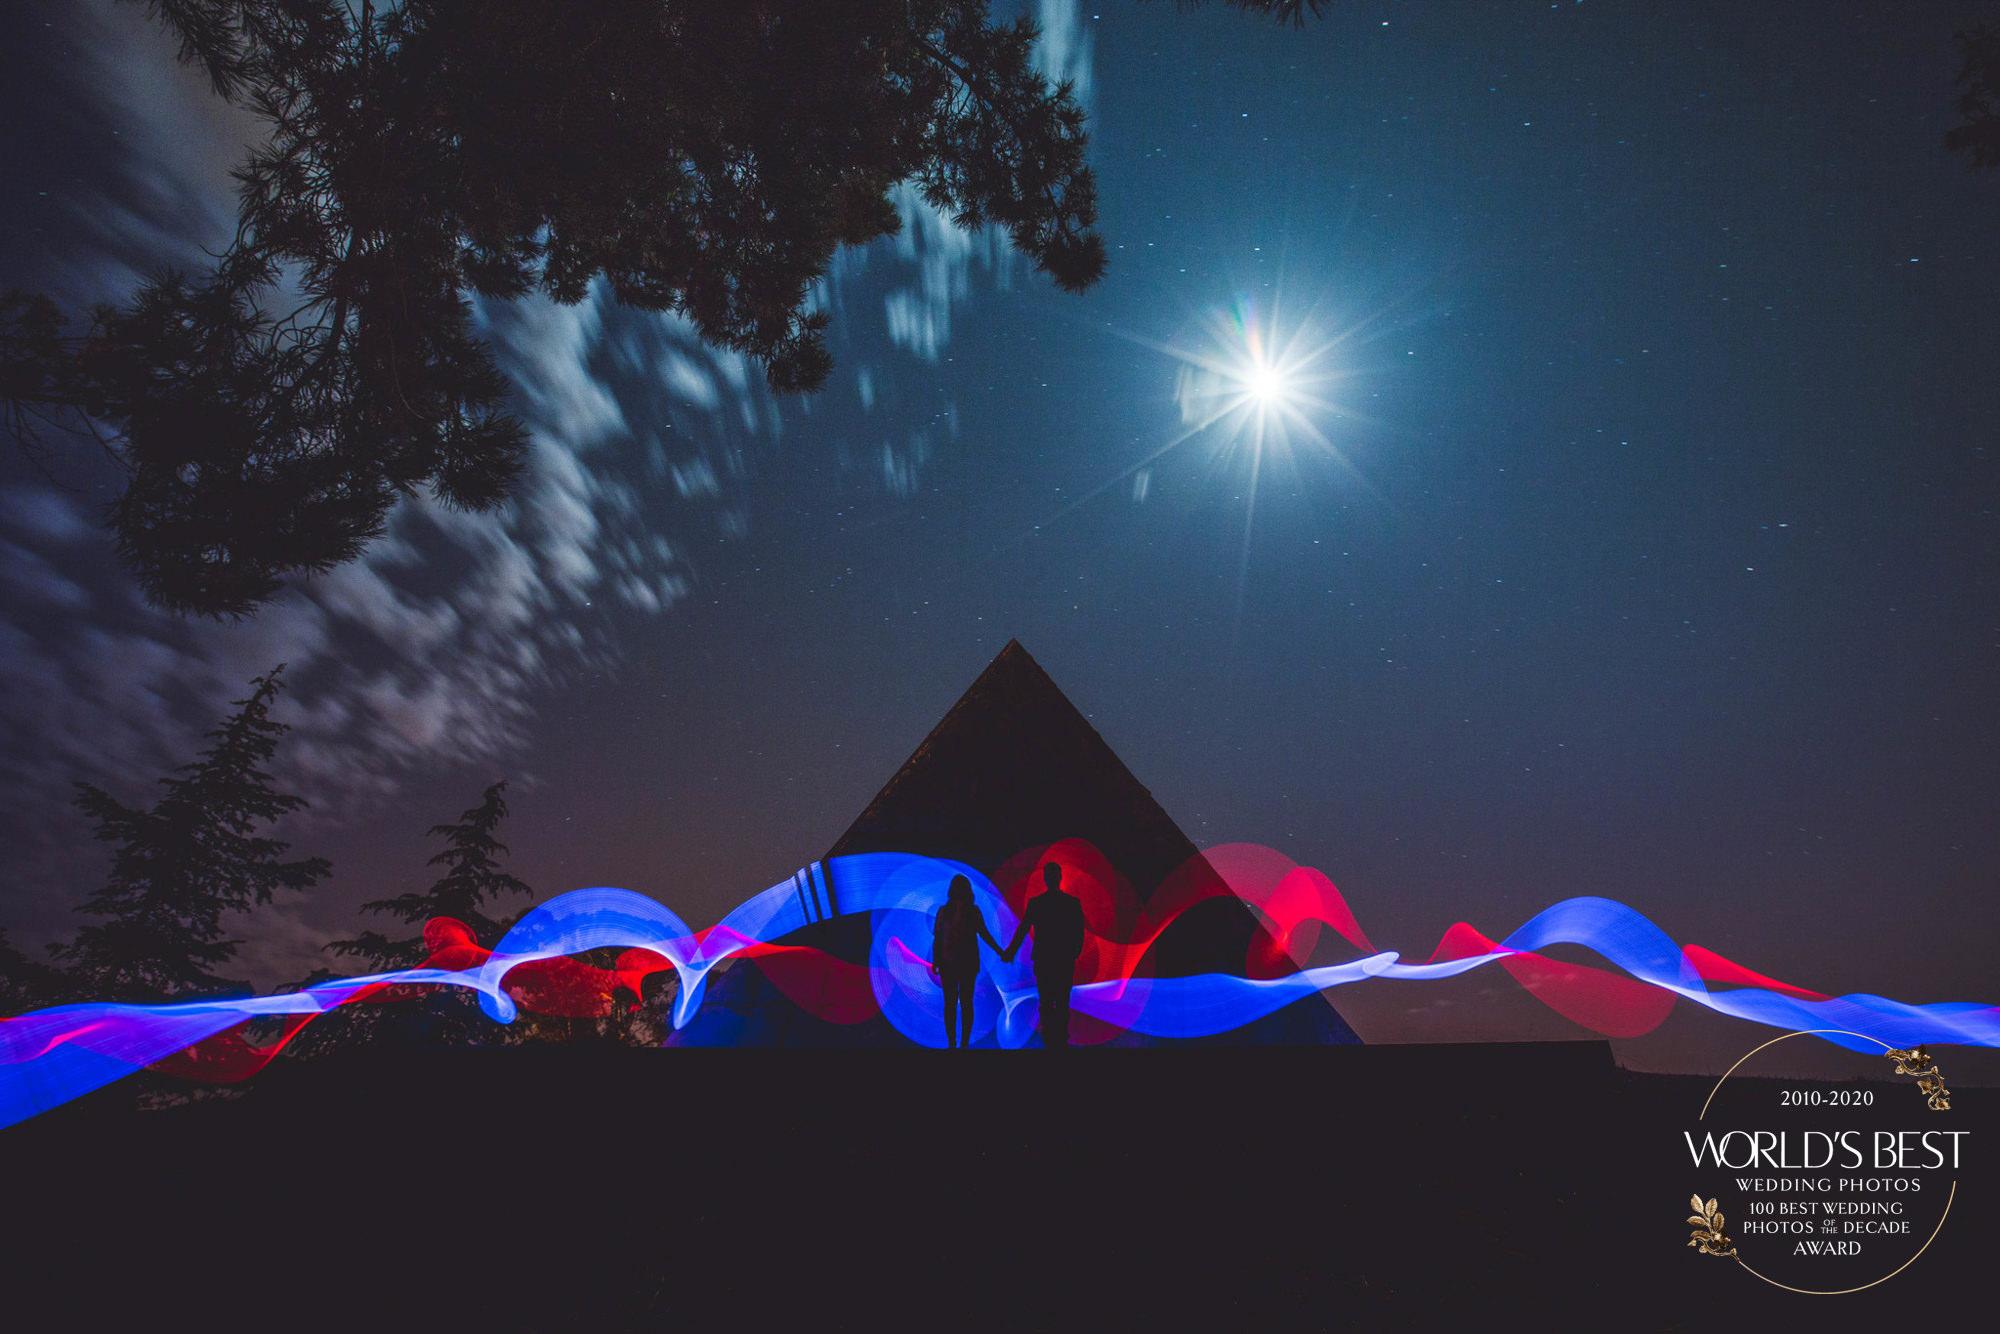 Award-winning long exposure taken with strobe lights by Jeff Newsom - Santa Barbara